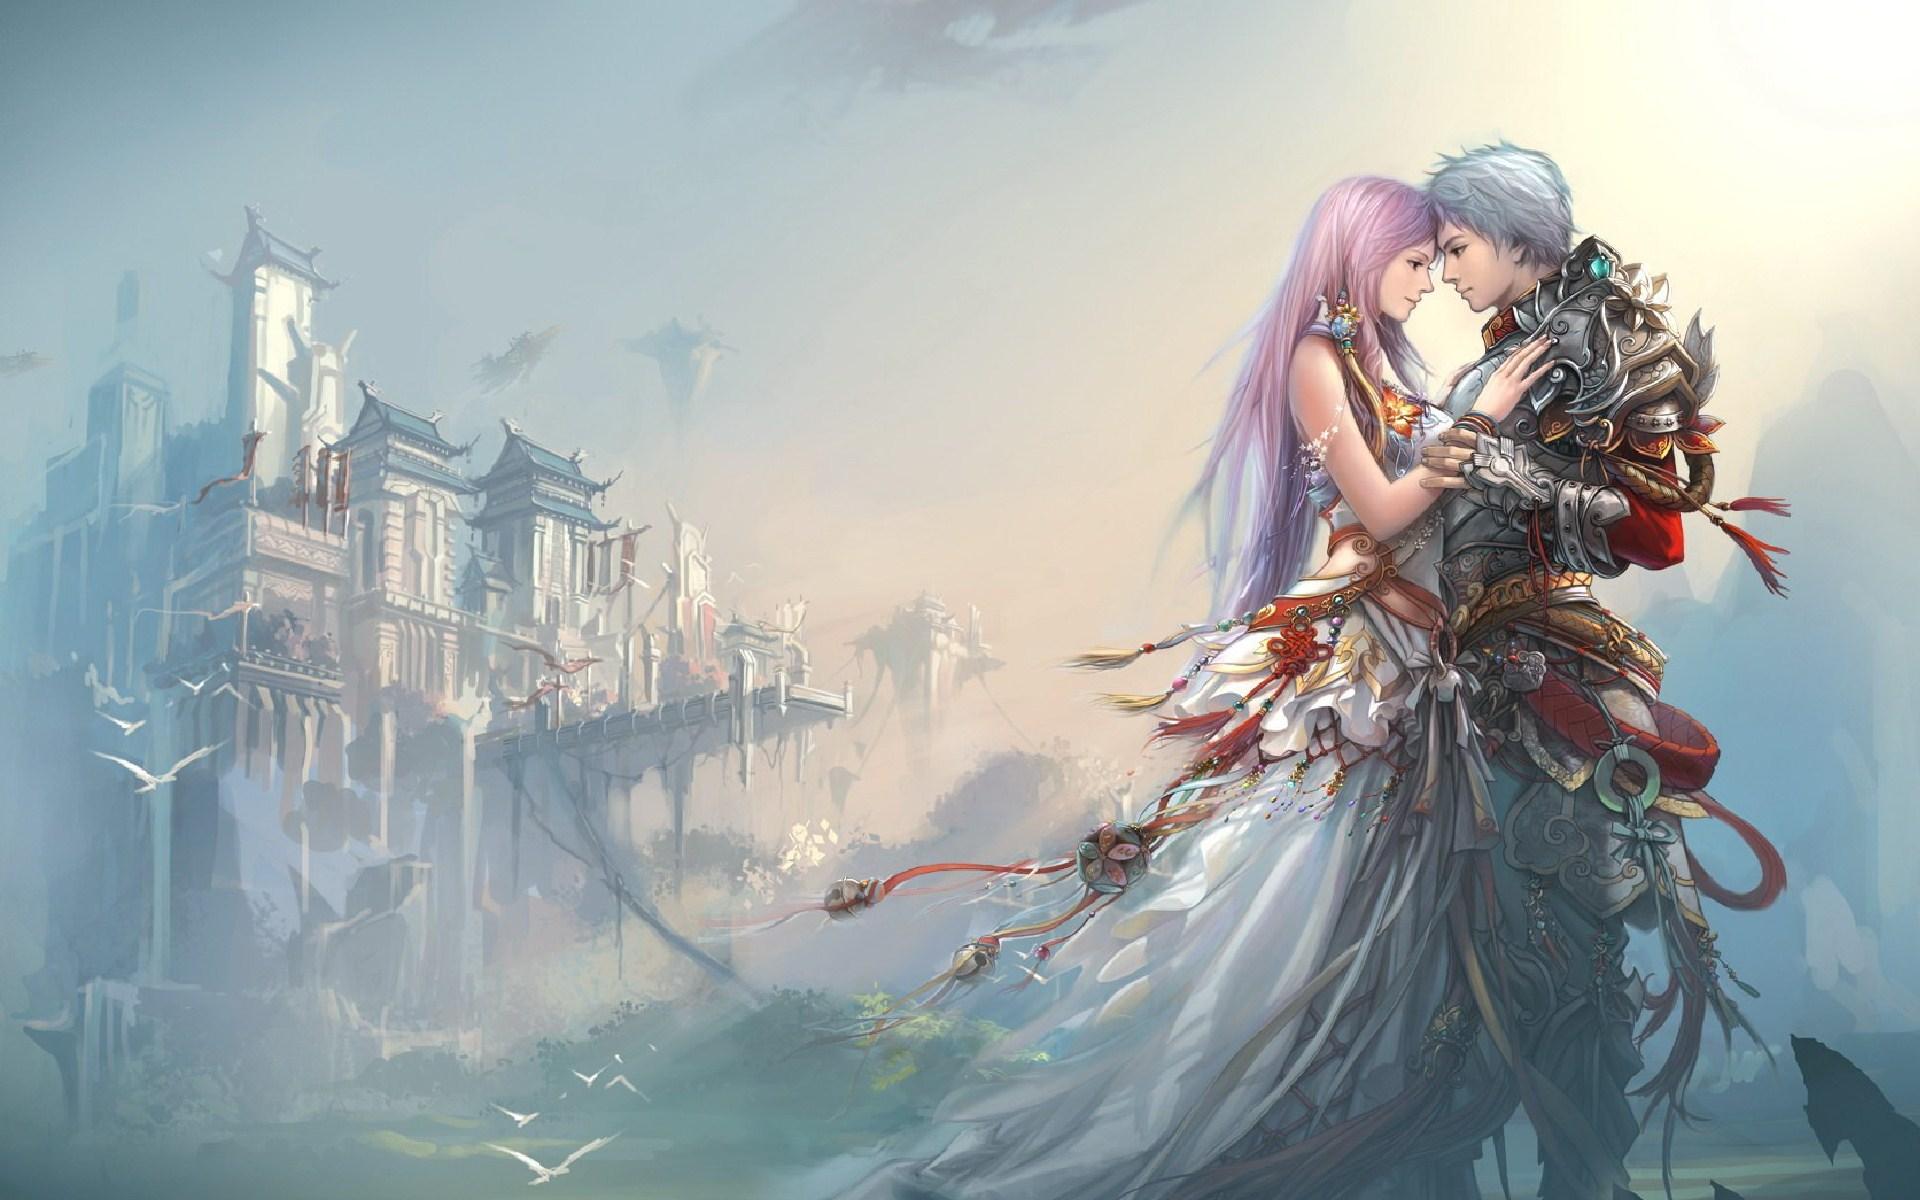 Hot Anime Wallpaper HD